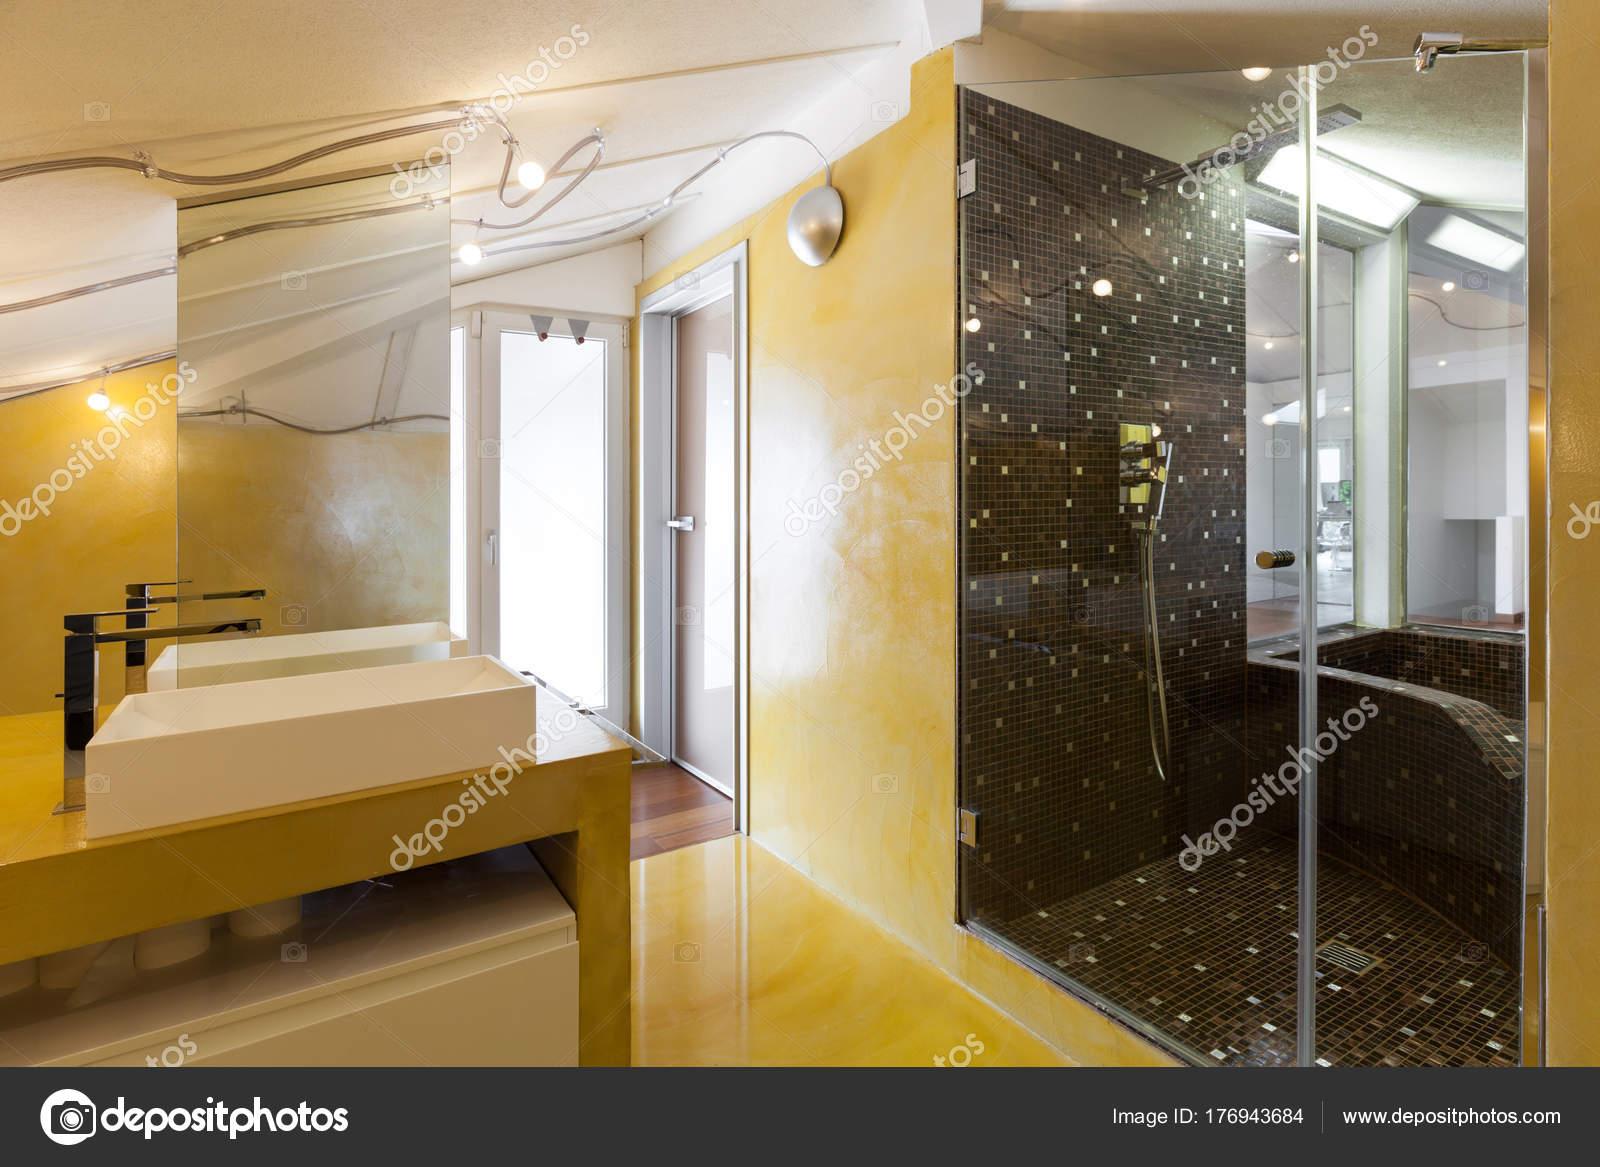 gele badkamer — Stockfoto © Zveiger #176943684